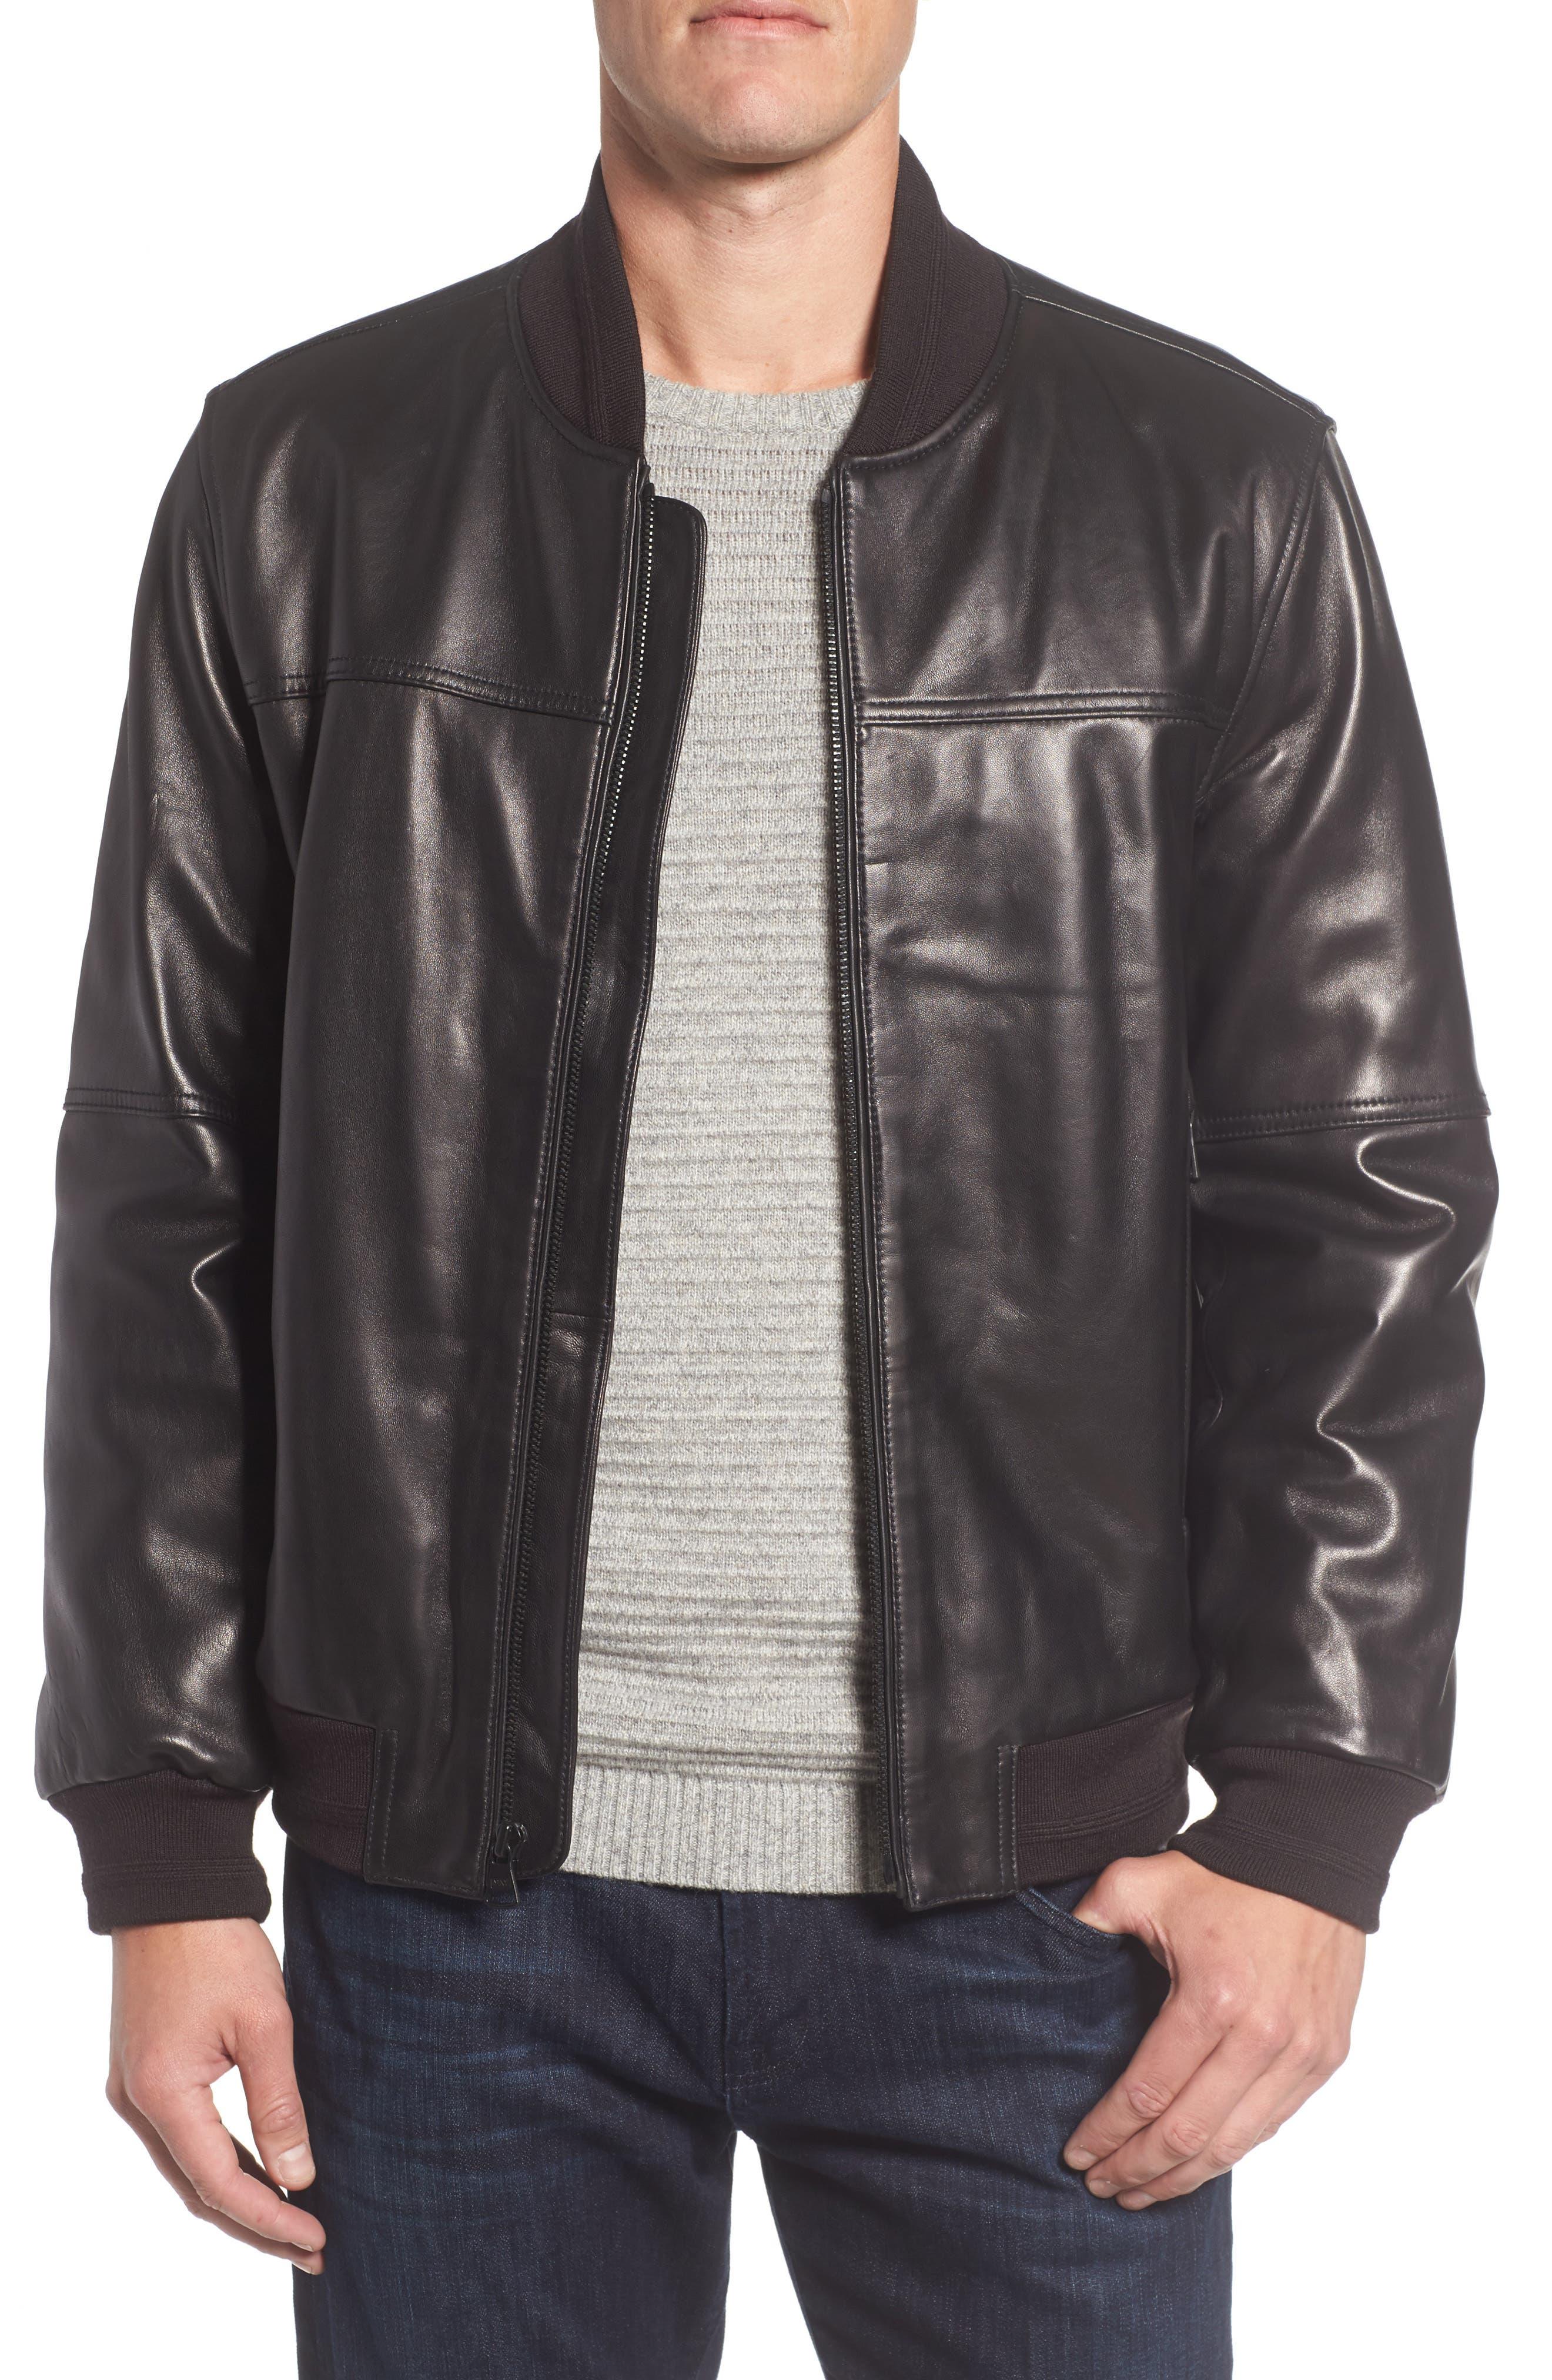 MARC NEW YORK, Summit Leather Jacket, Main thumbnail 1, color, BLACK